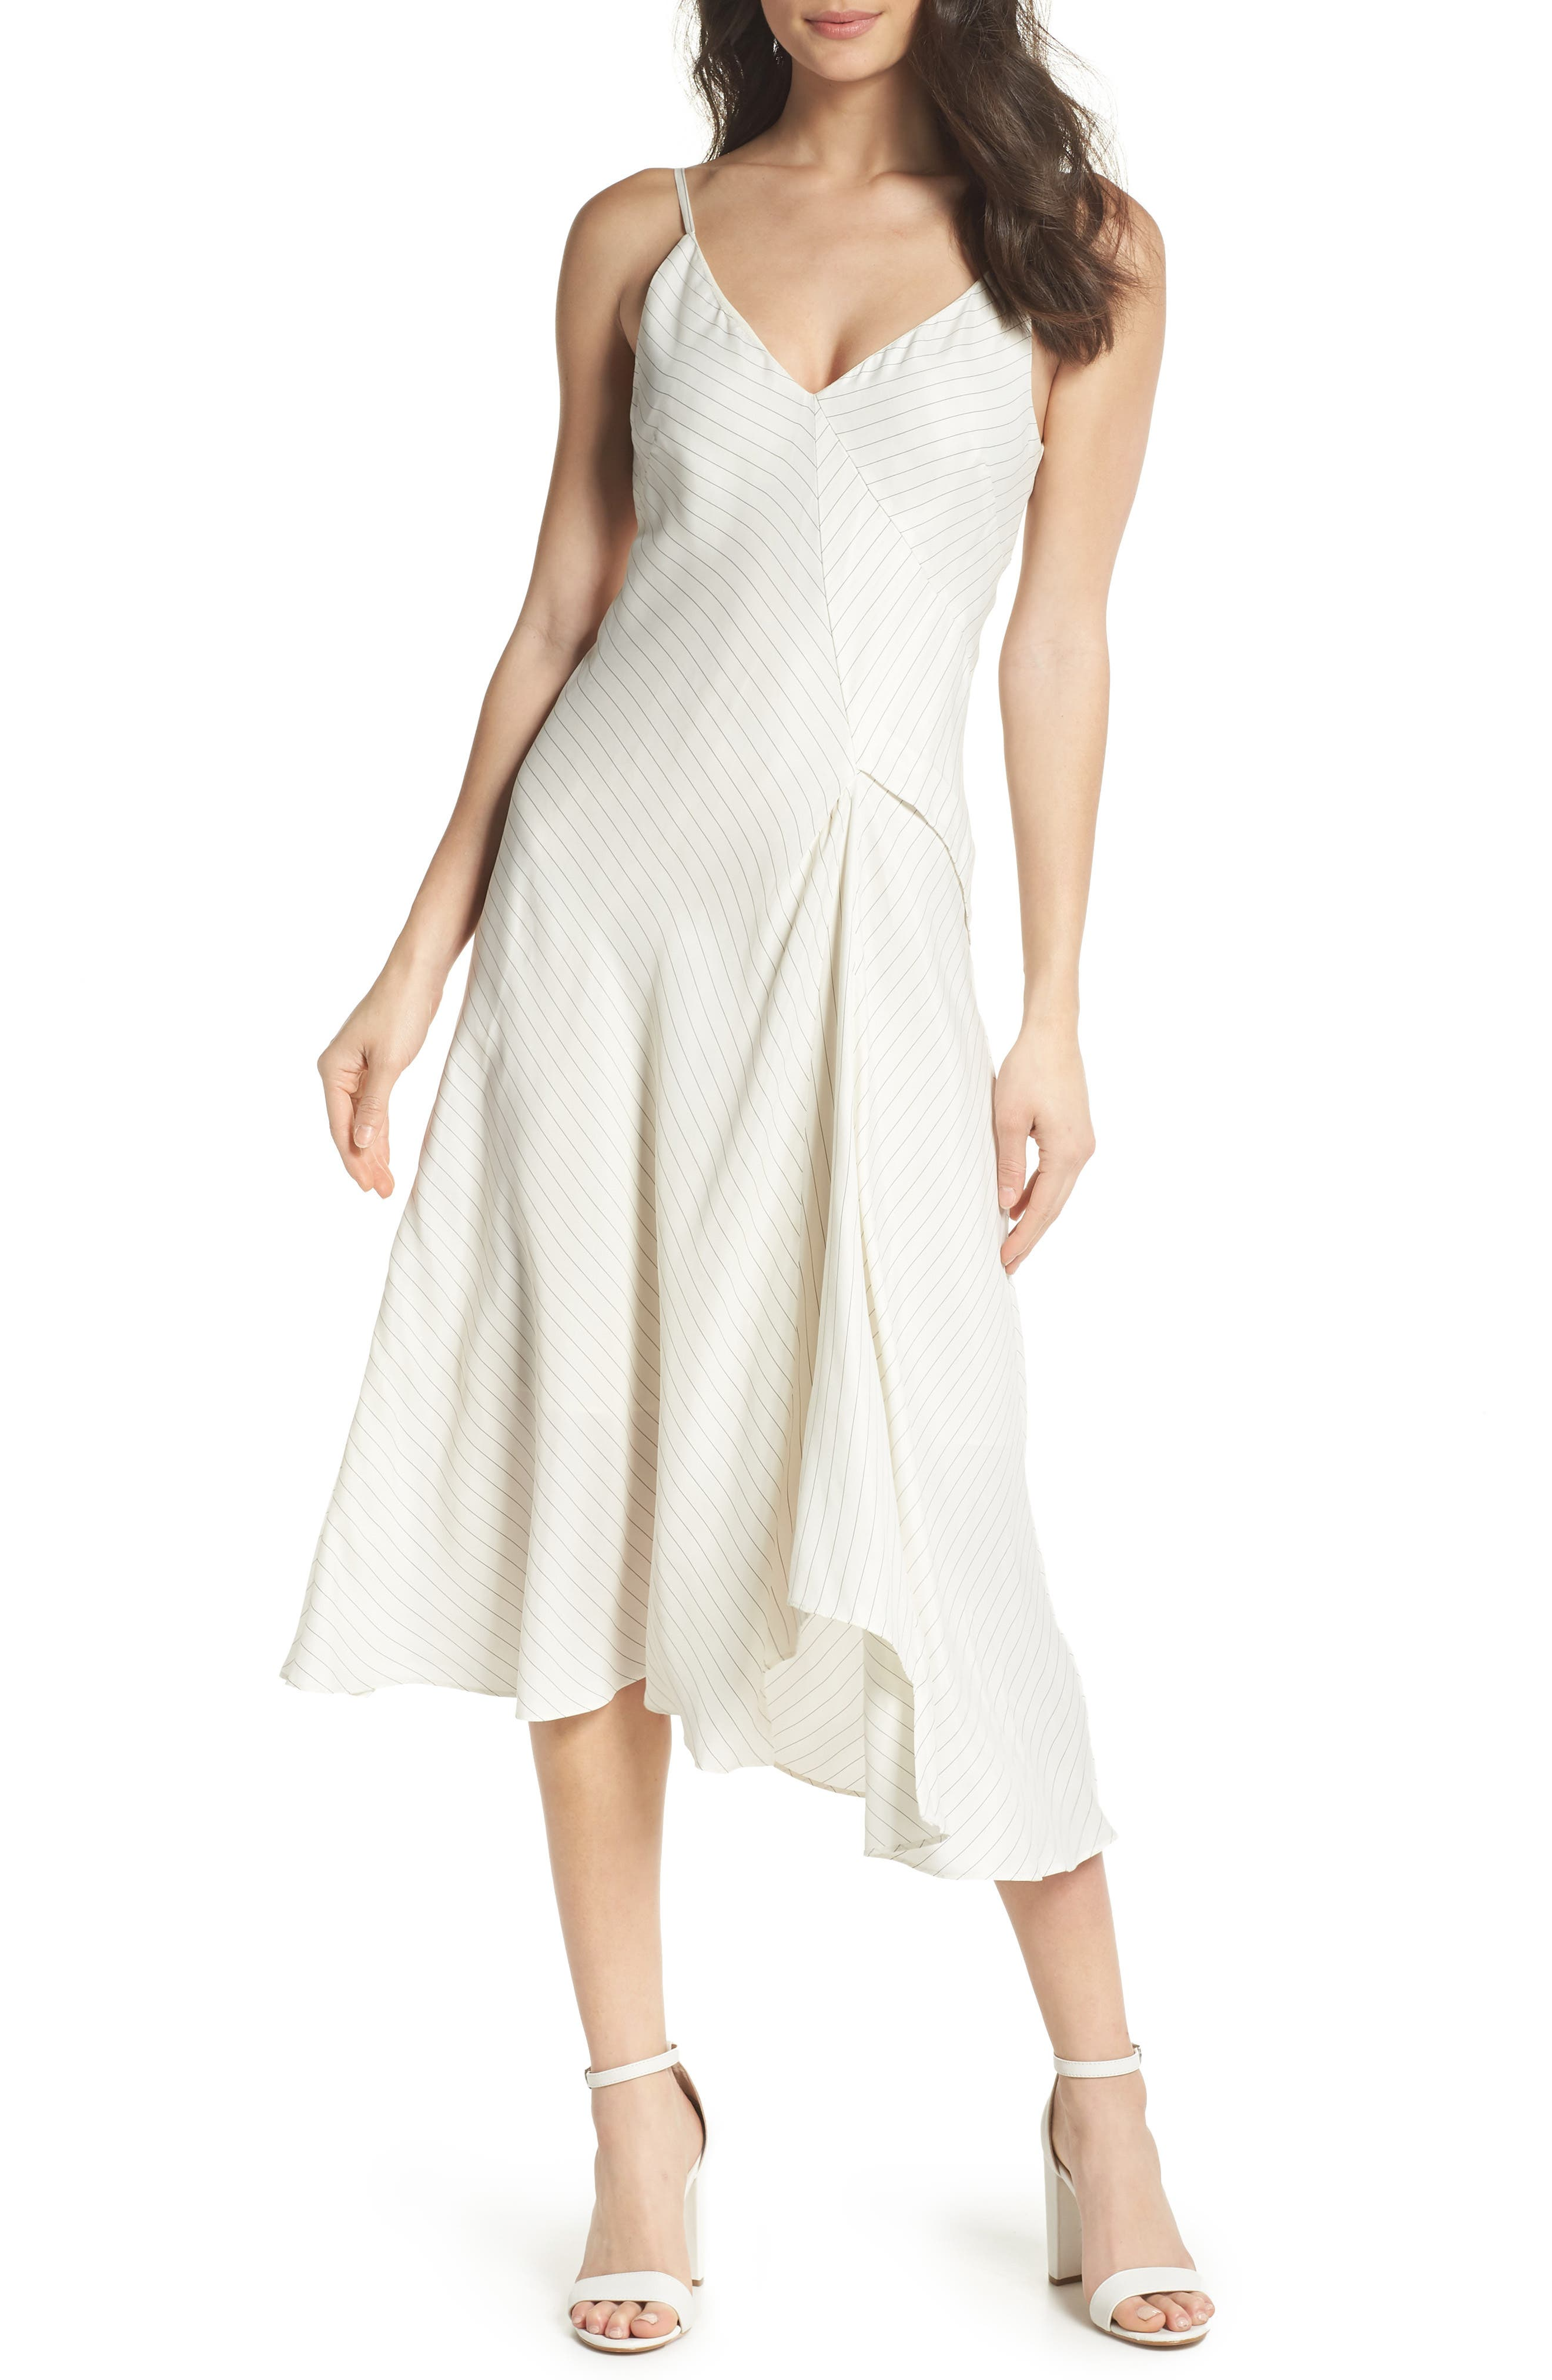 Bay Area Pinstripe Asymmetric Midi Dress,                             Main thumbnail 1, color,                             105